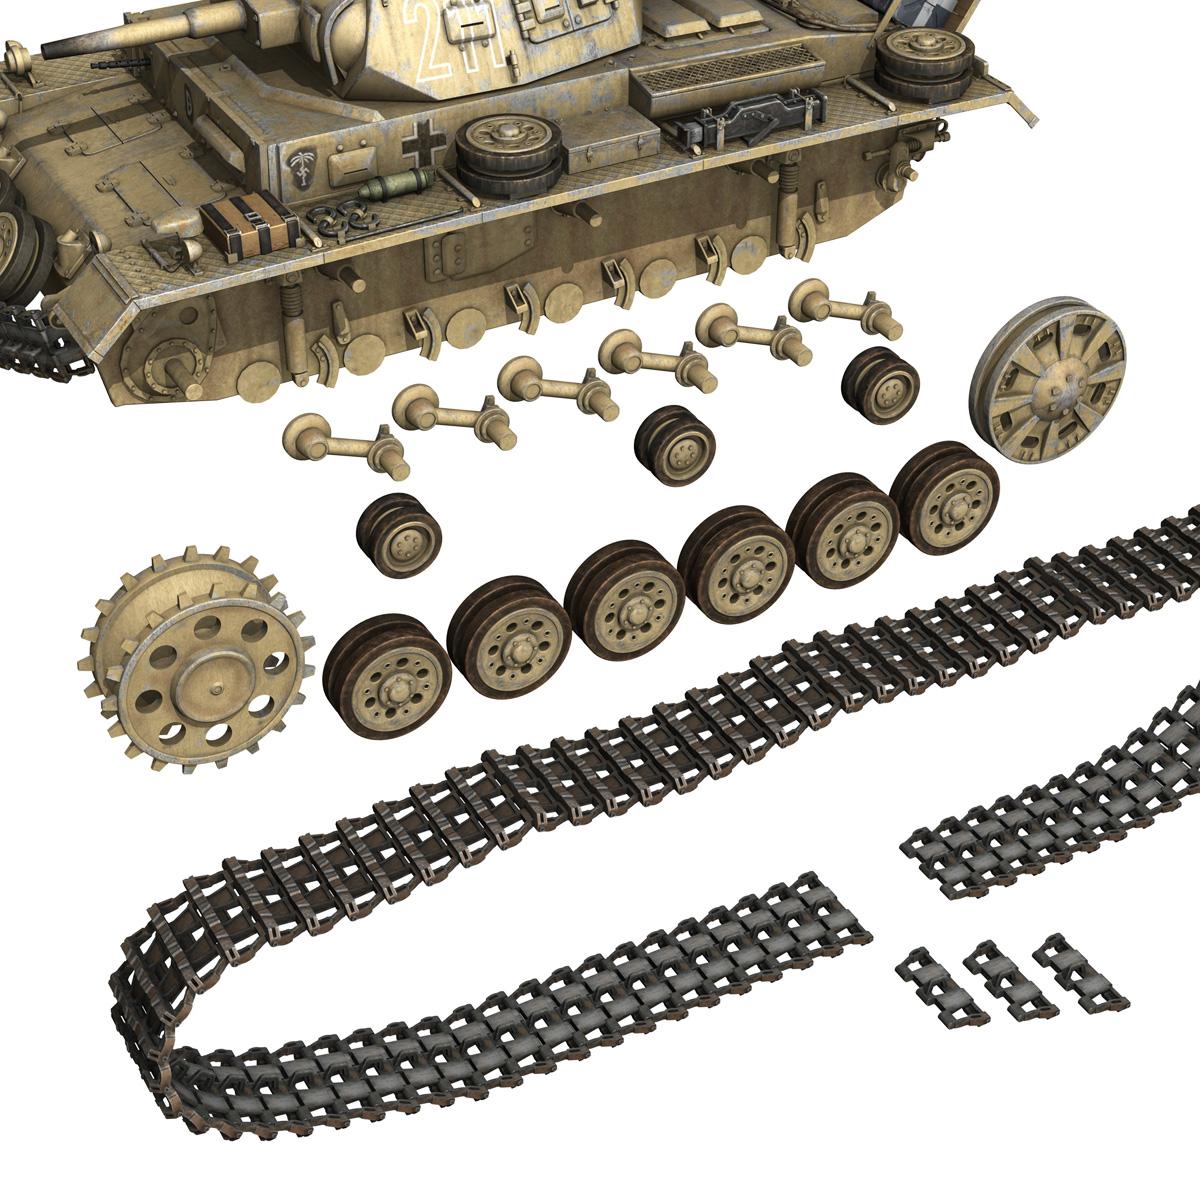 pzkpfw iii – panzer 3 – ausf.g – dak – 211 3d model 3ds c4d fbx lwo lw lws obj 266472